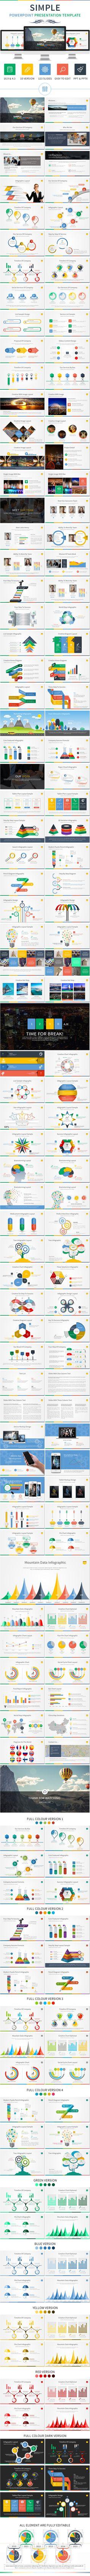 Simple Powerpoint Presentation Template #slides #design Download: http://graphicriver.net/item/simple-powerpoint-presentation-template/13937983?ref=ksioks